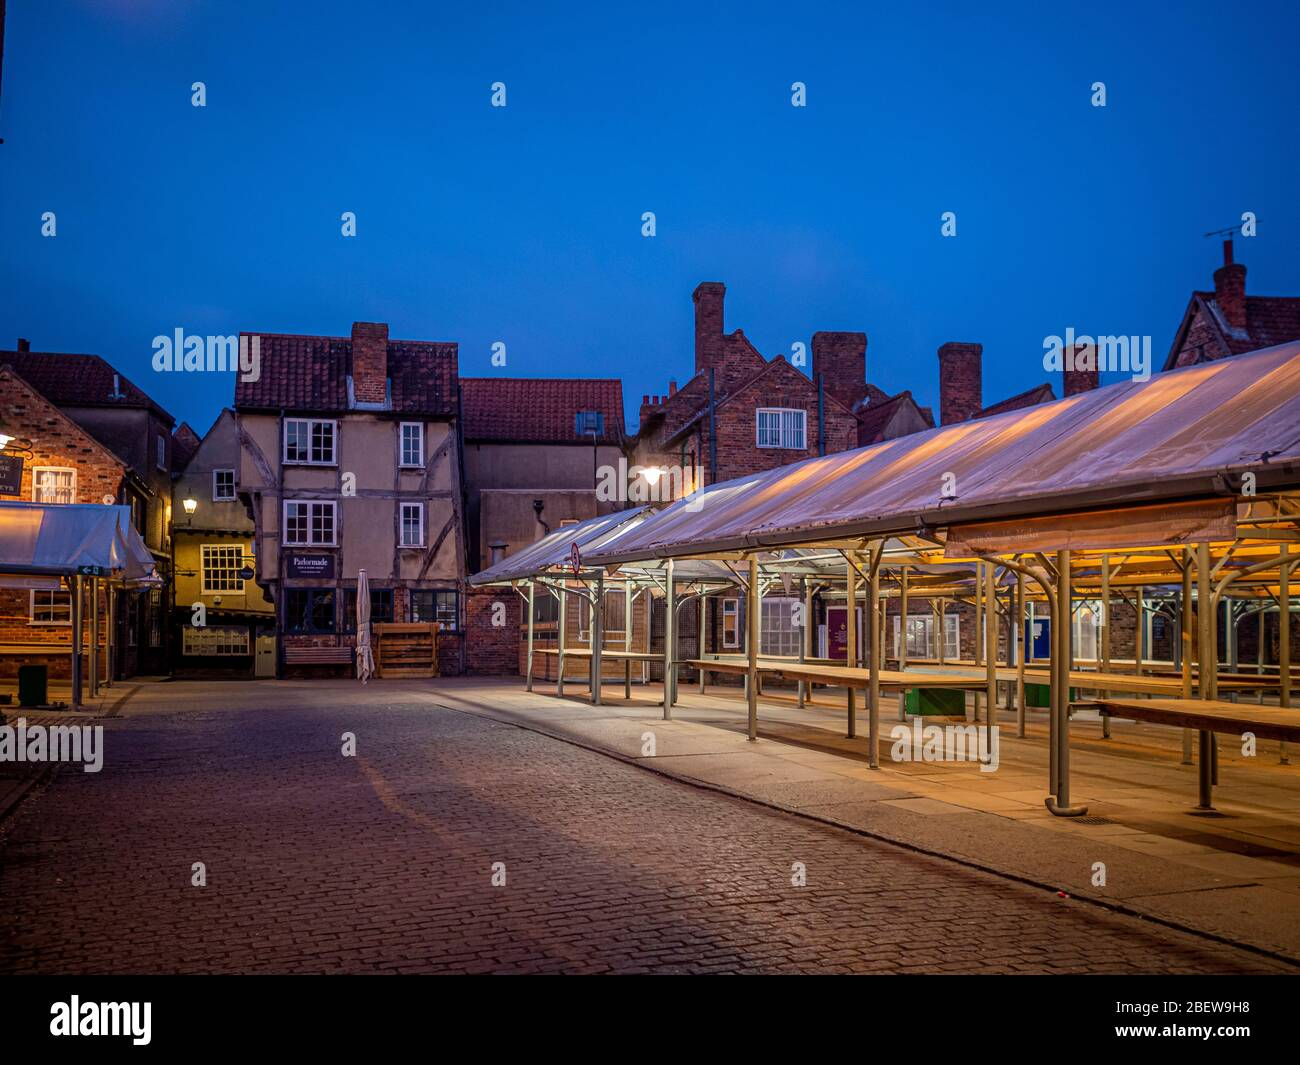 Shambles Market York City Centre Early Evening Empty Due To Covid 19 Lockdown Uk Stock Photo Alamy